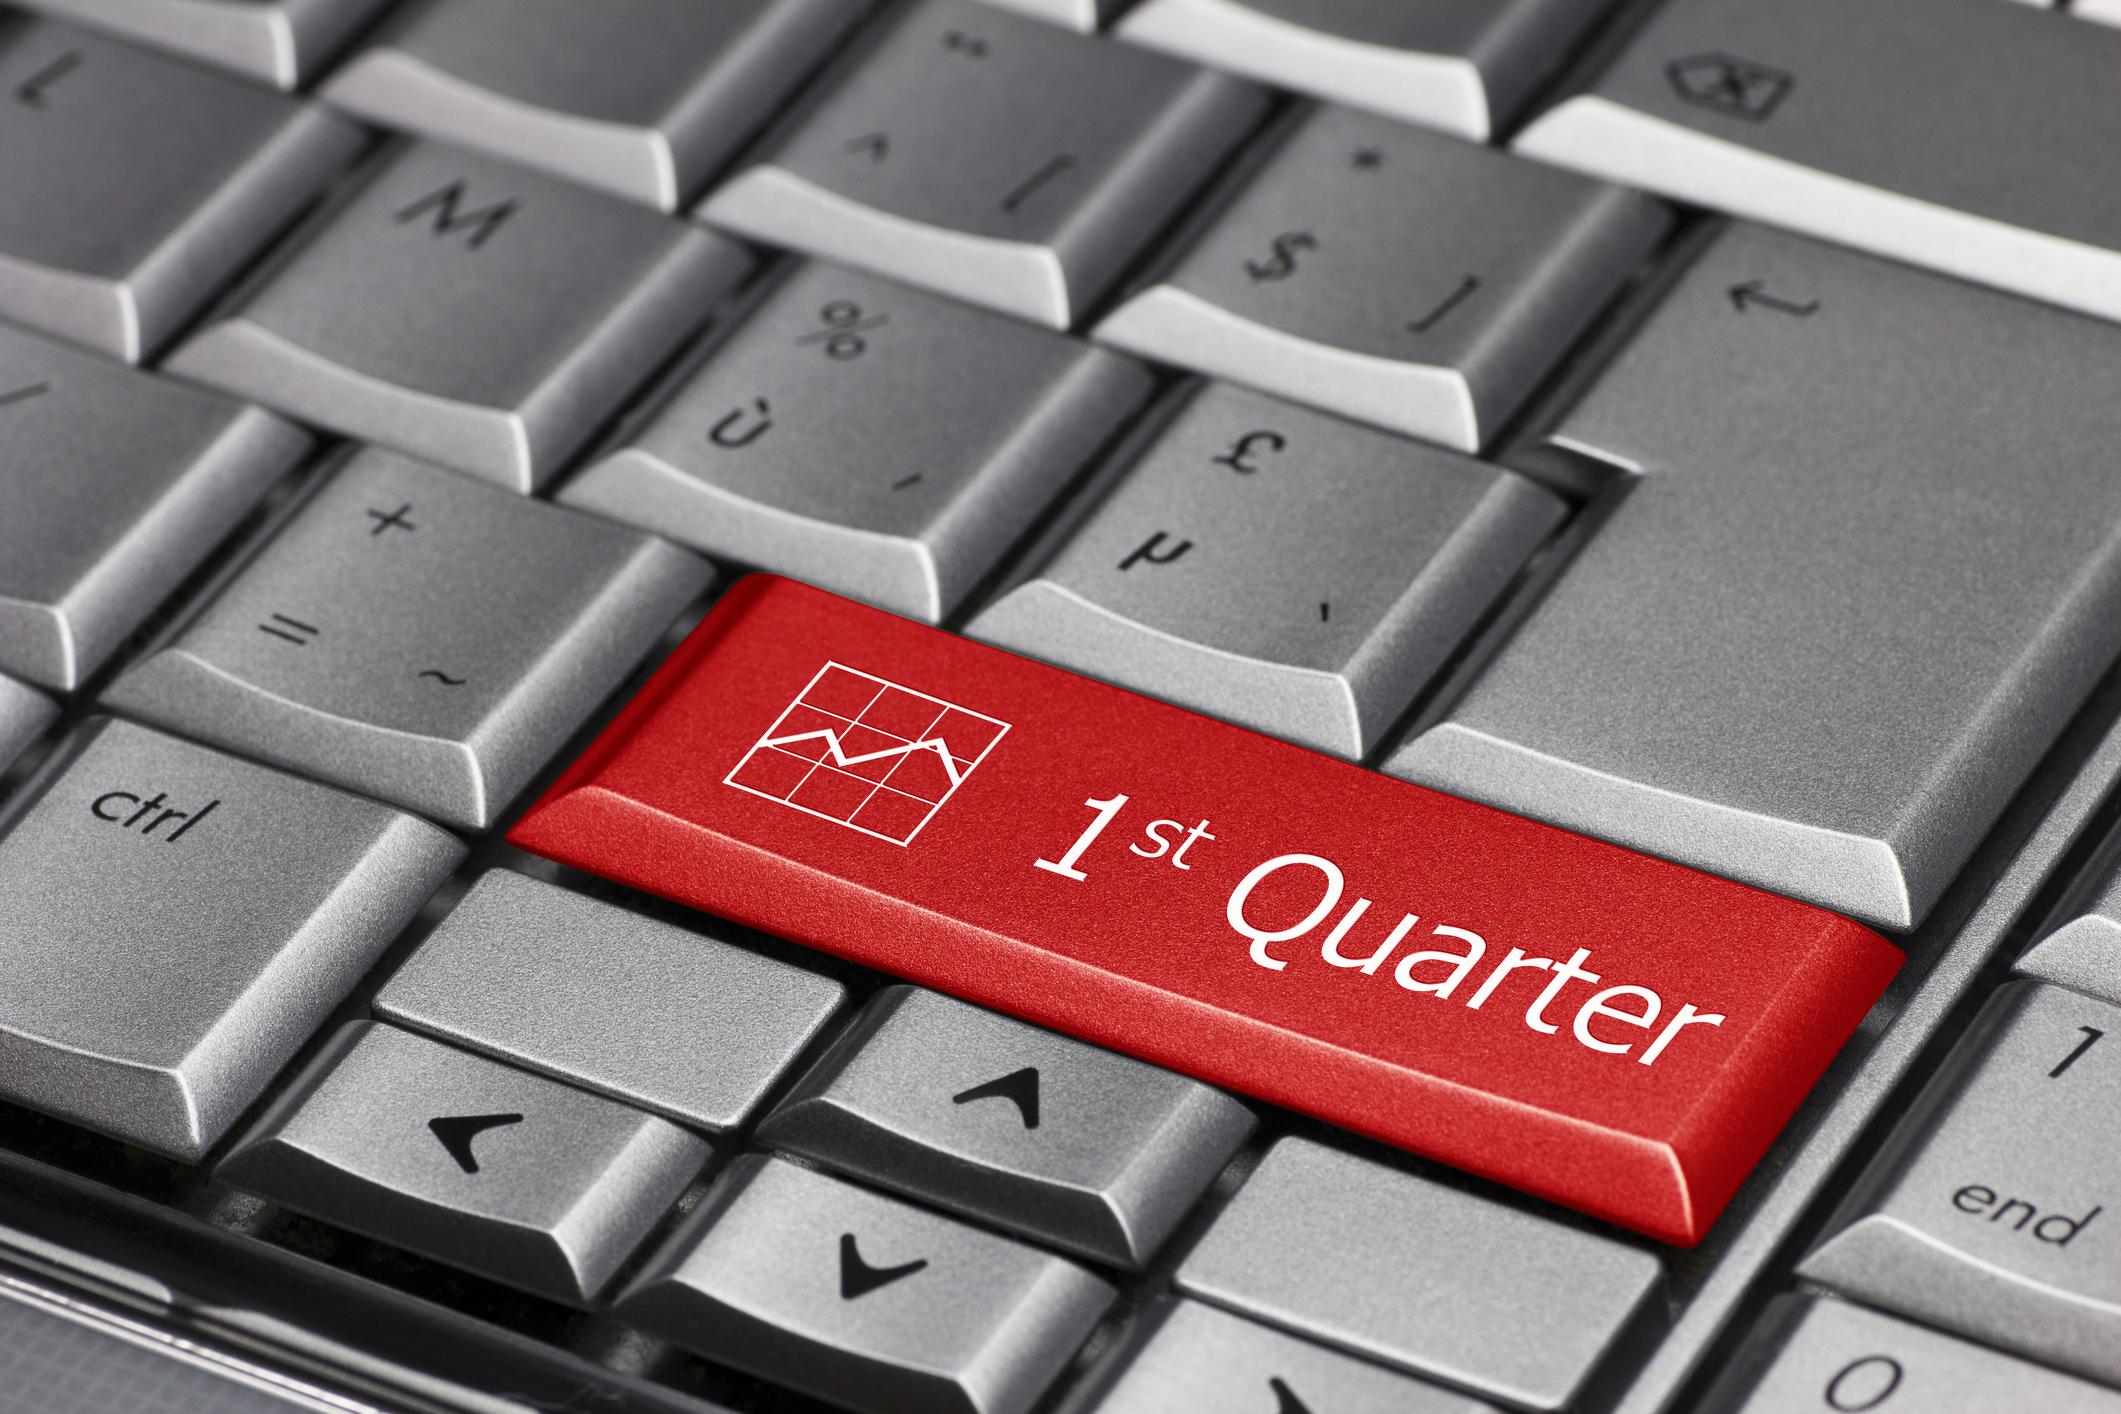 first quarter key on keyboard